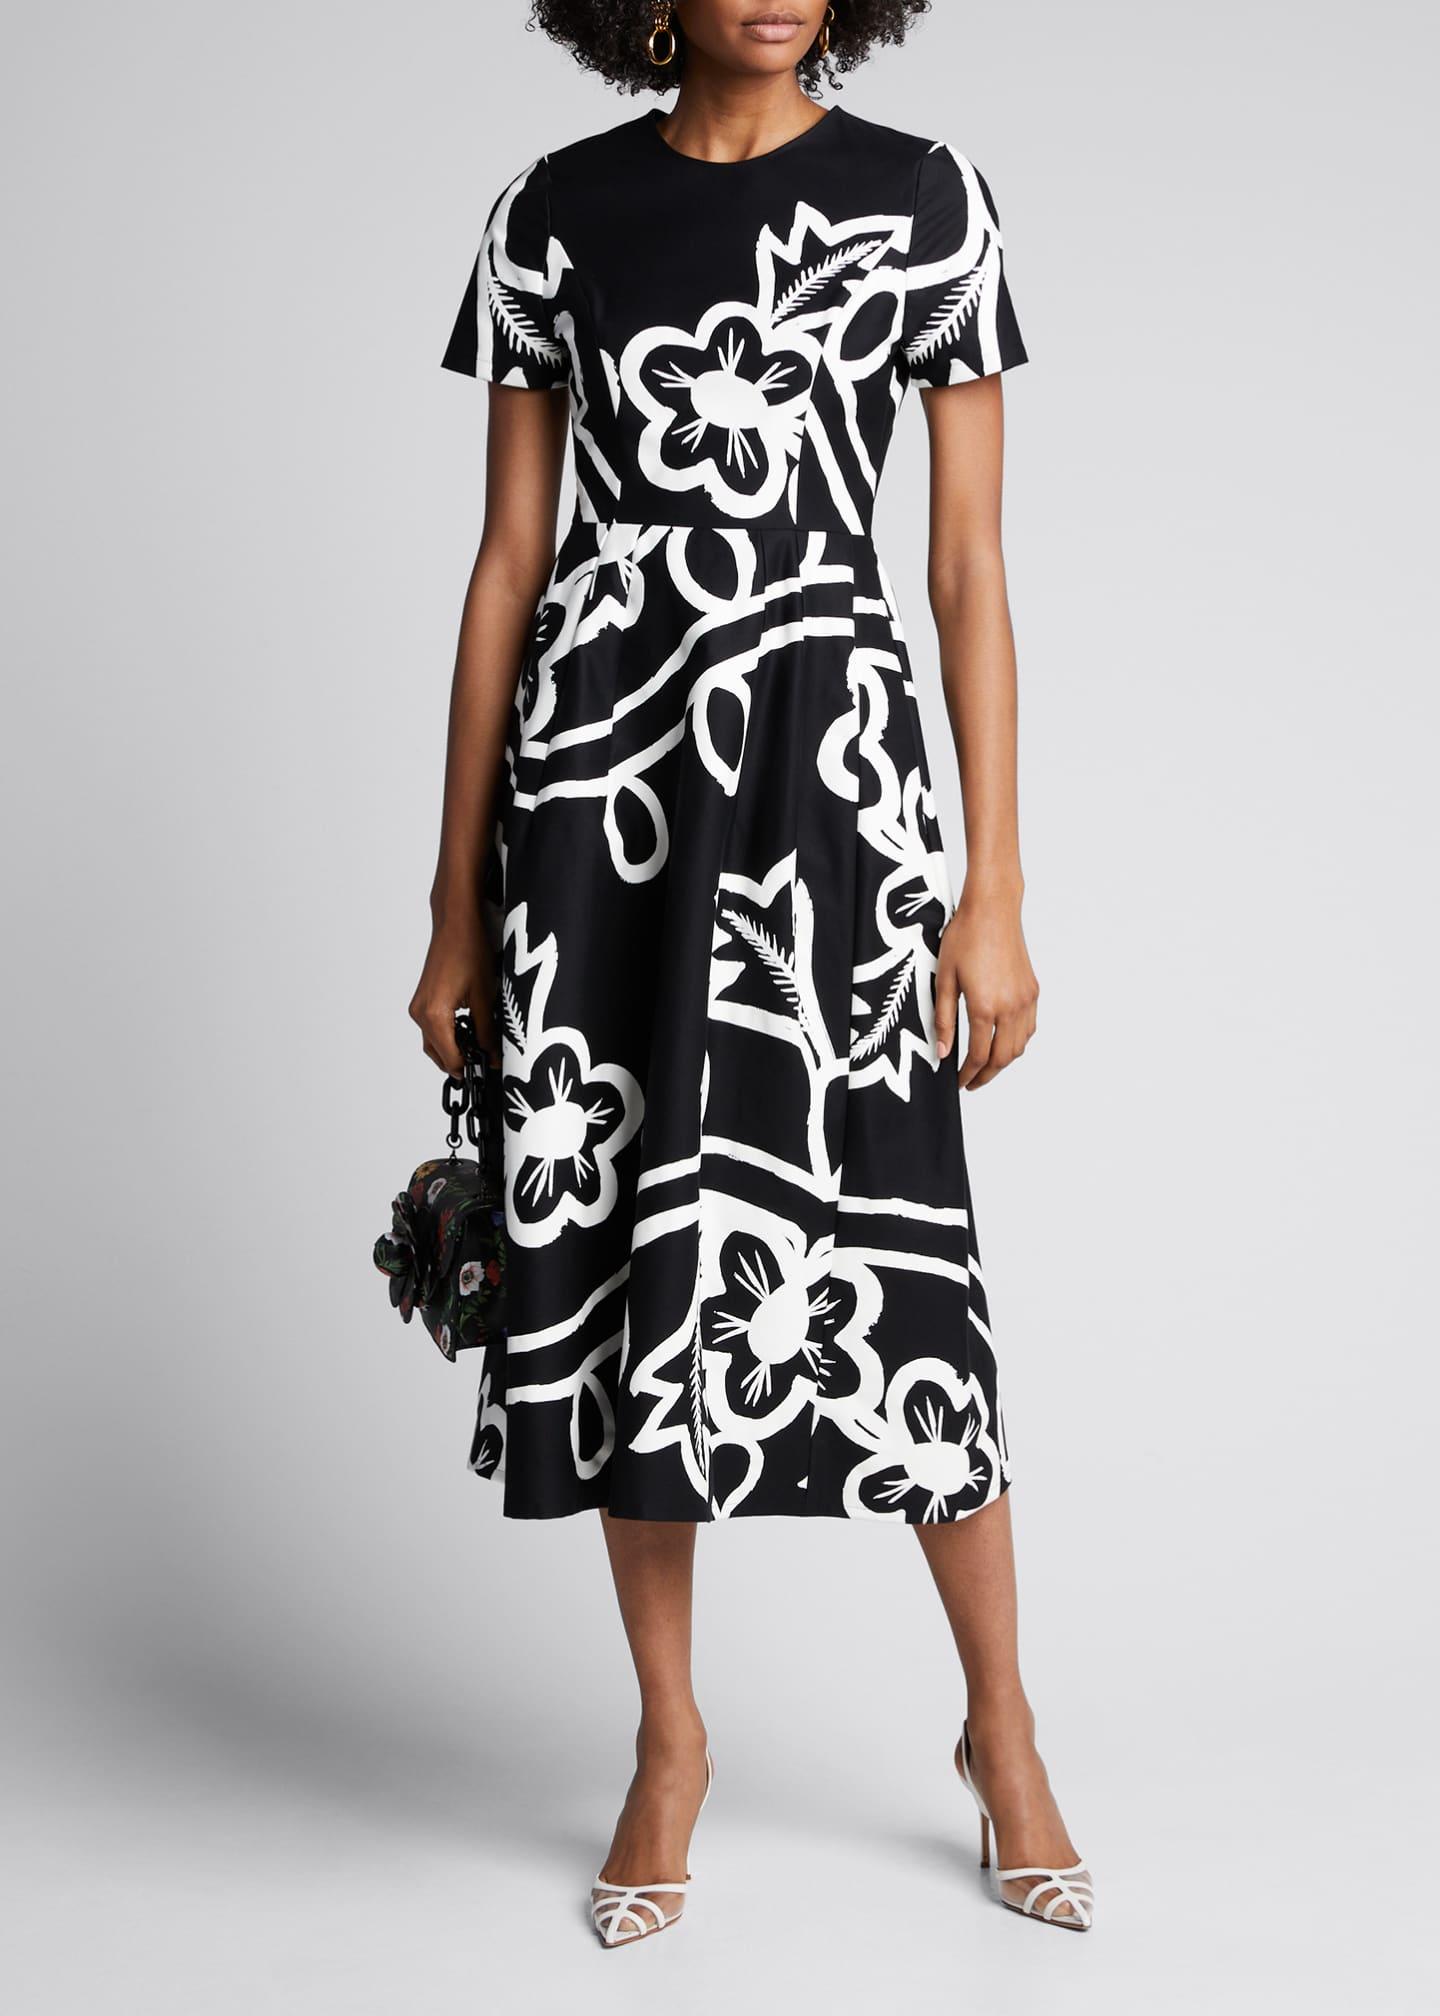 Carolina Herrera Floral-Print Poplin Short-Sleeve Dress